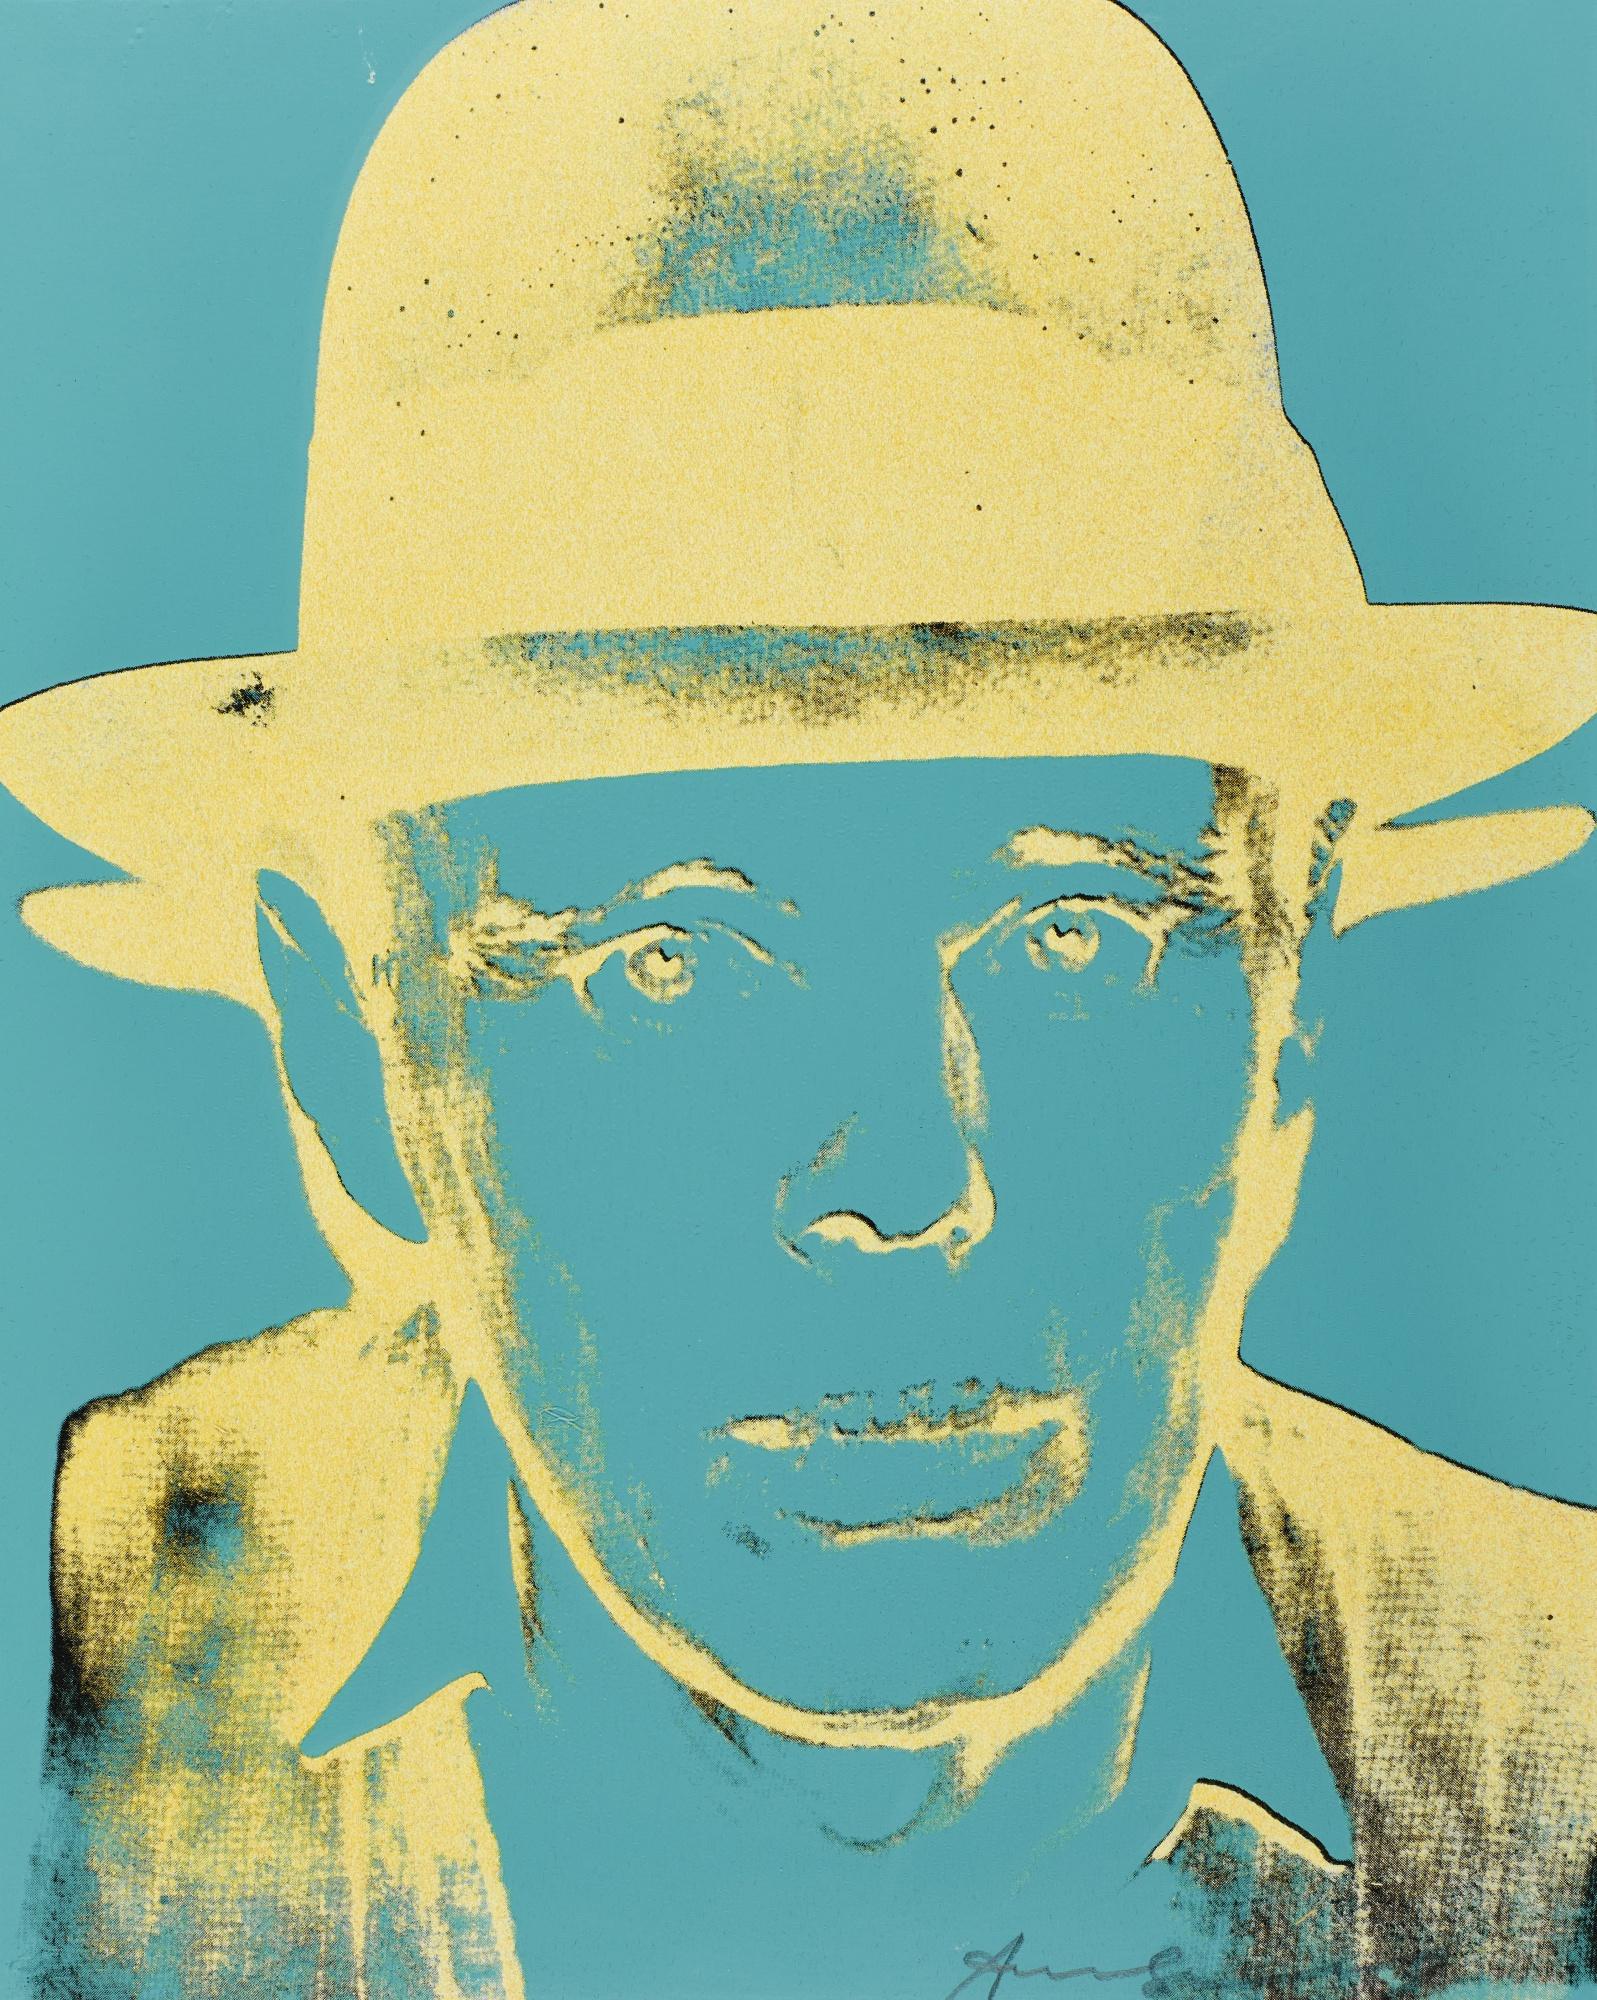 Andy Warhol-Joseph Beuys: State IIi(See F. & S. II.244)-1983